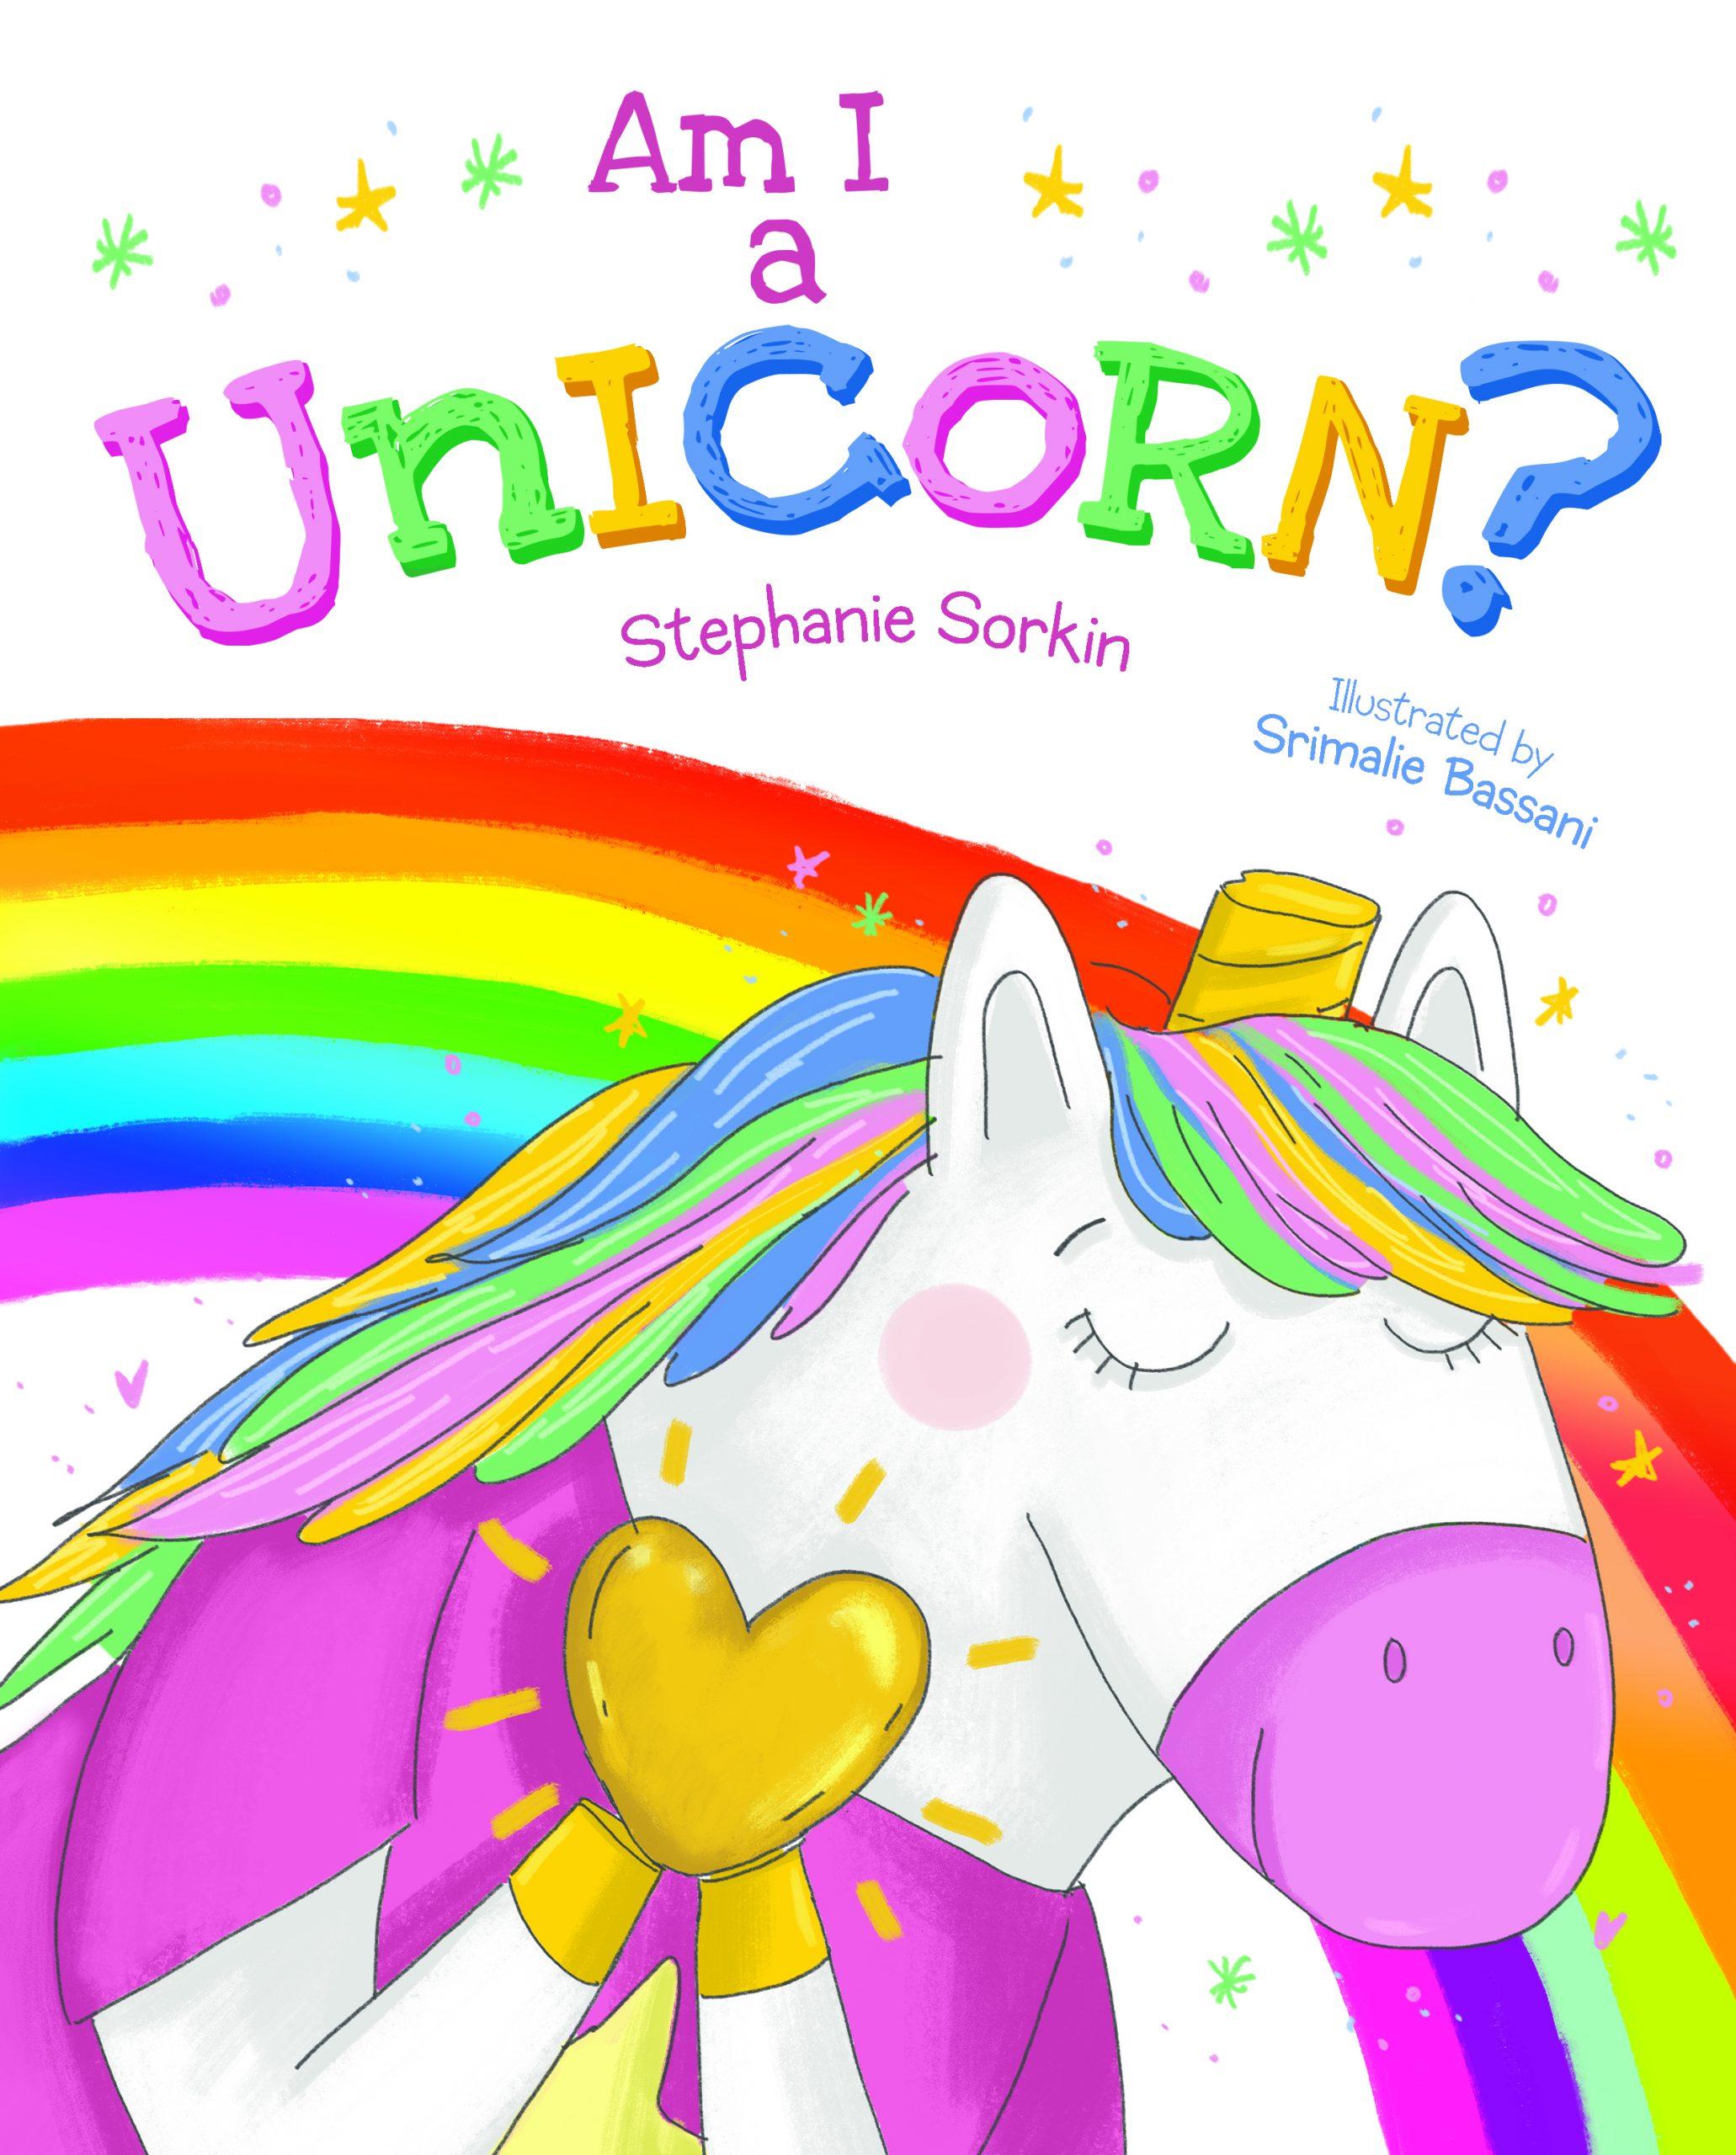 Am I a Unicorn